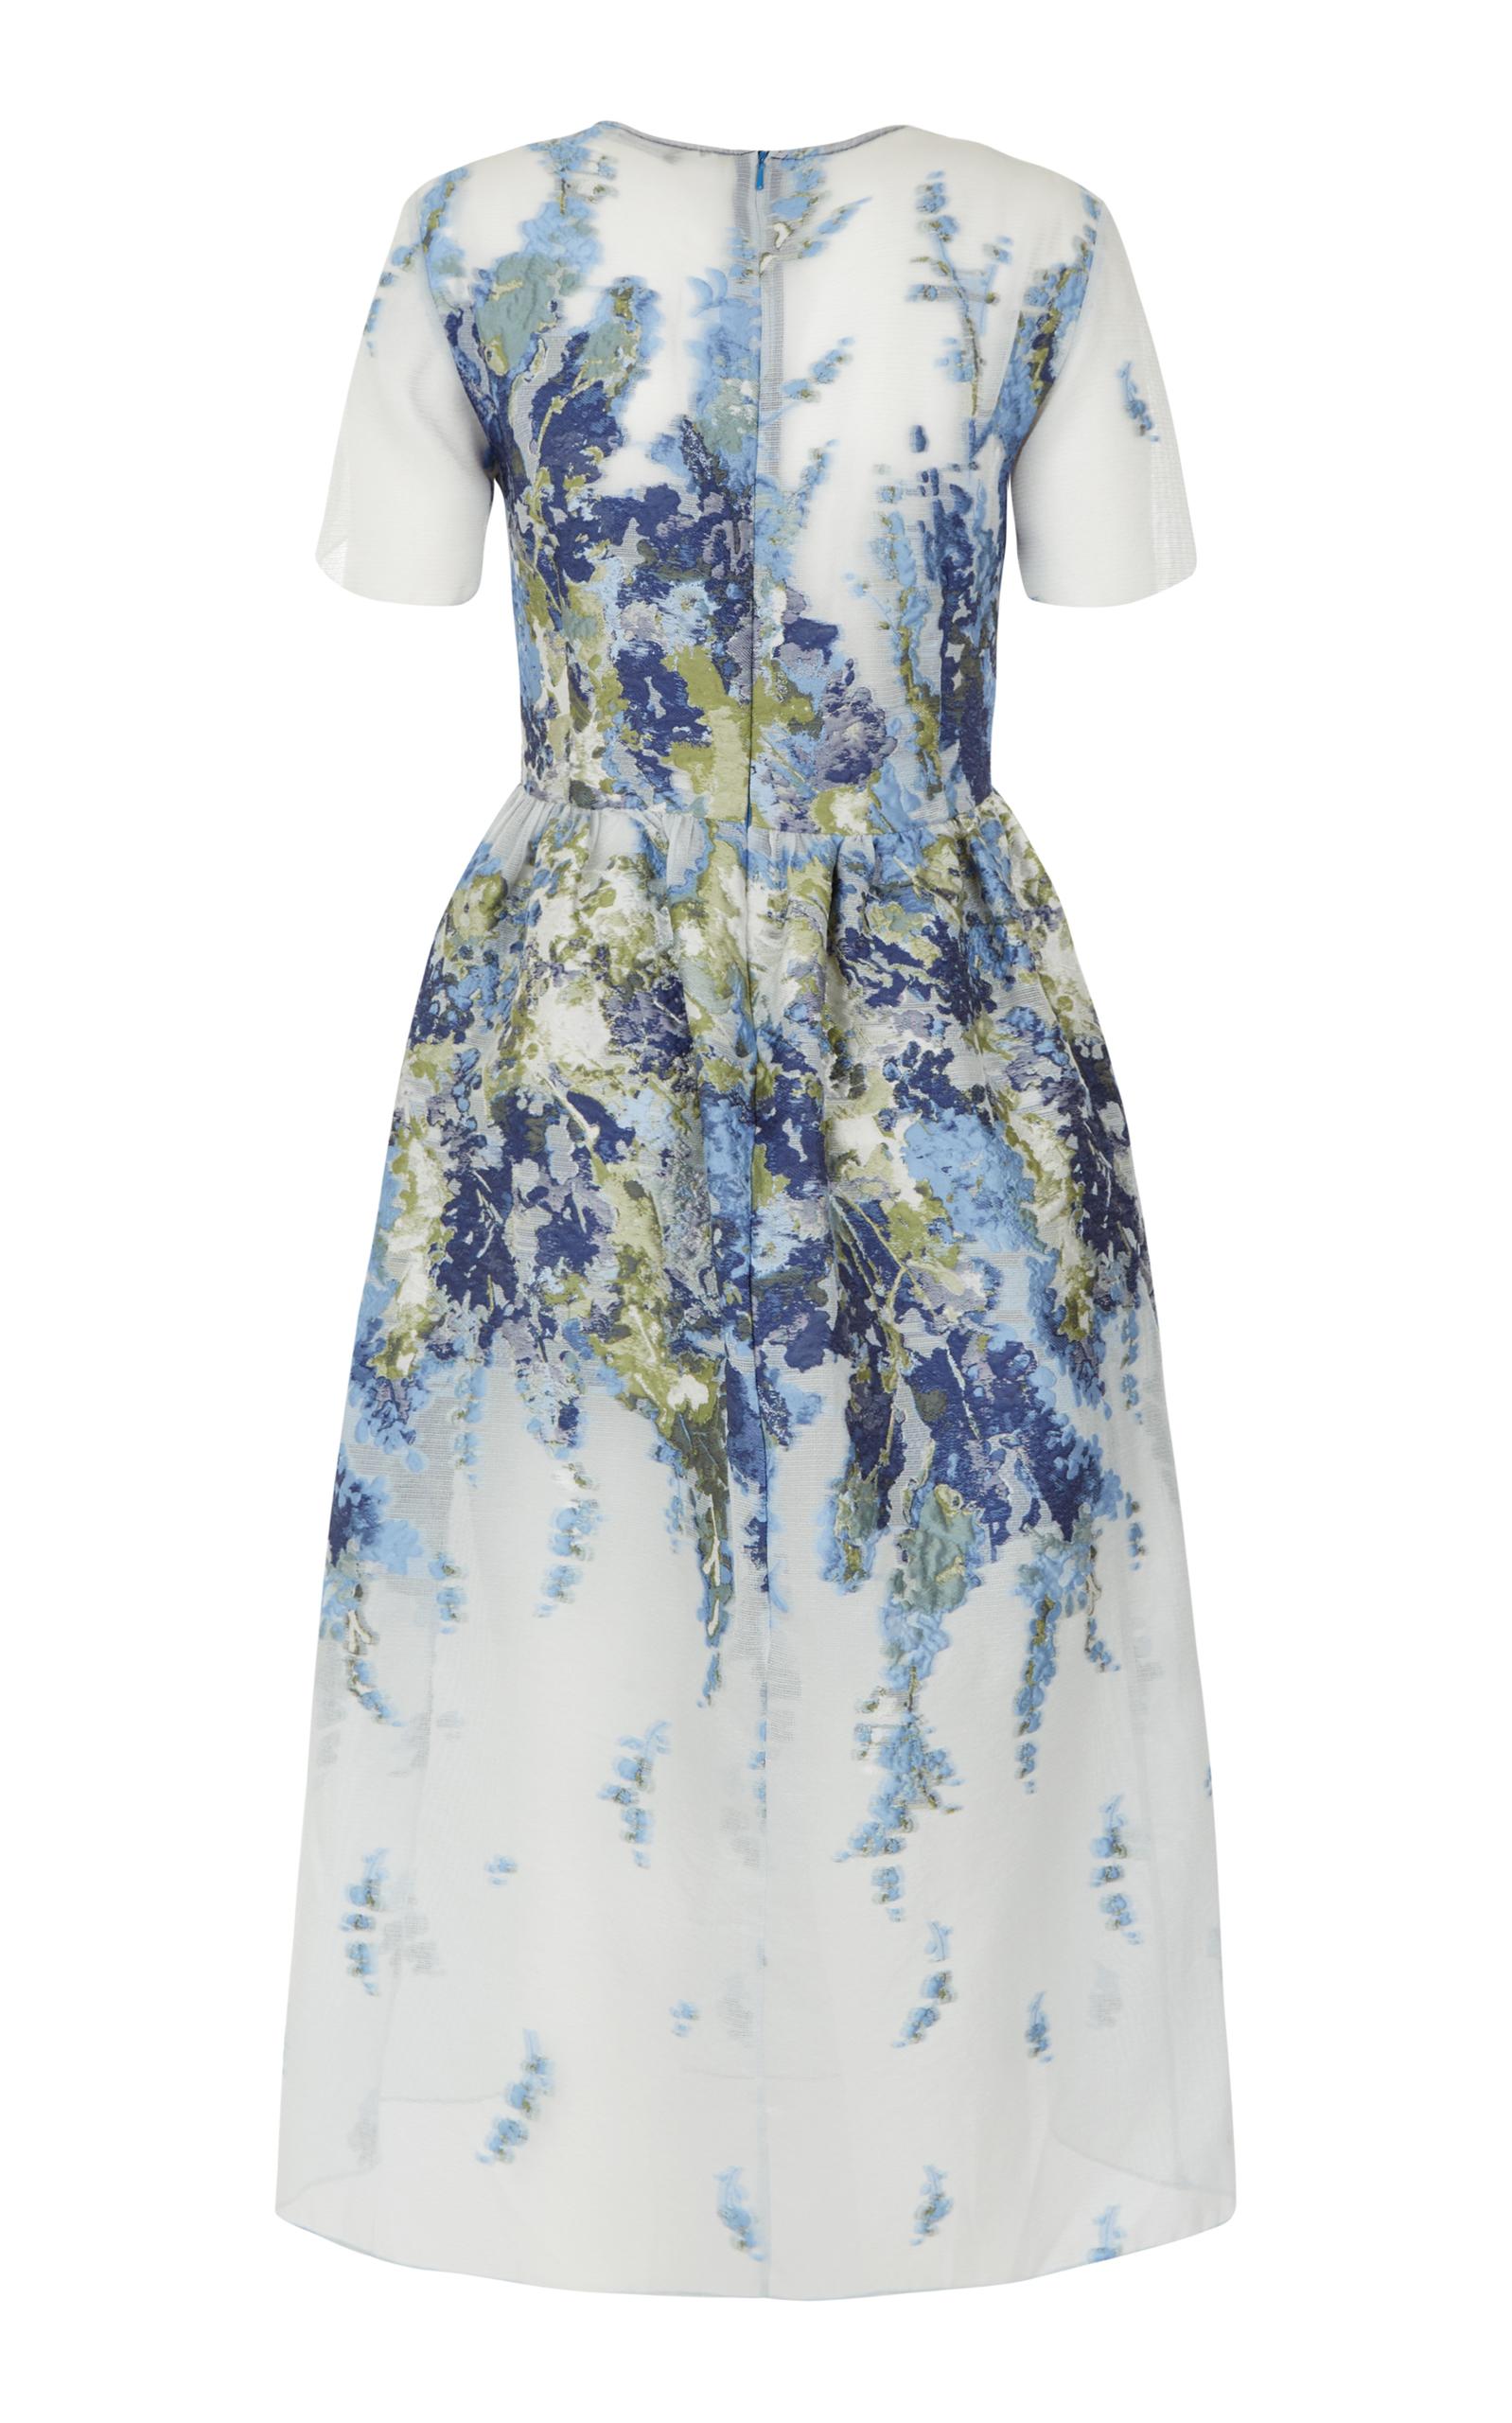 b2e17c8f1c55 Malene Oddershede BachHaze Floral Midi Dress. CLOSE. Loading. Loading